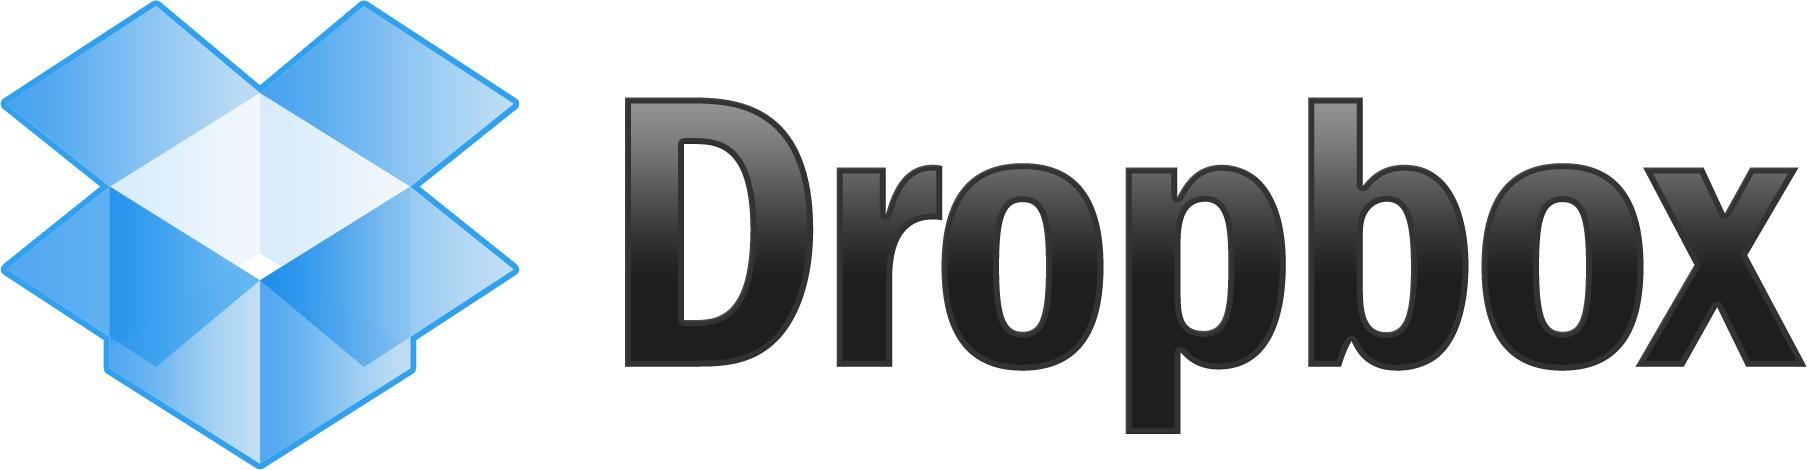 dropbox logo webtoolwiki